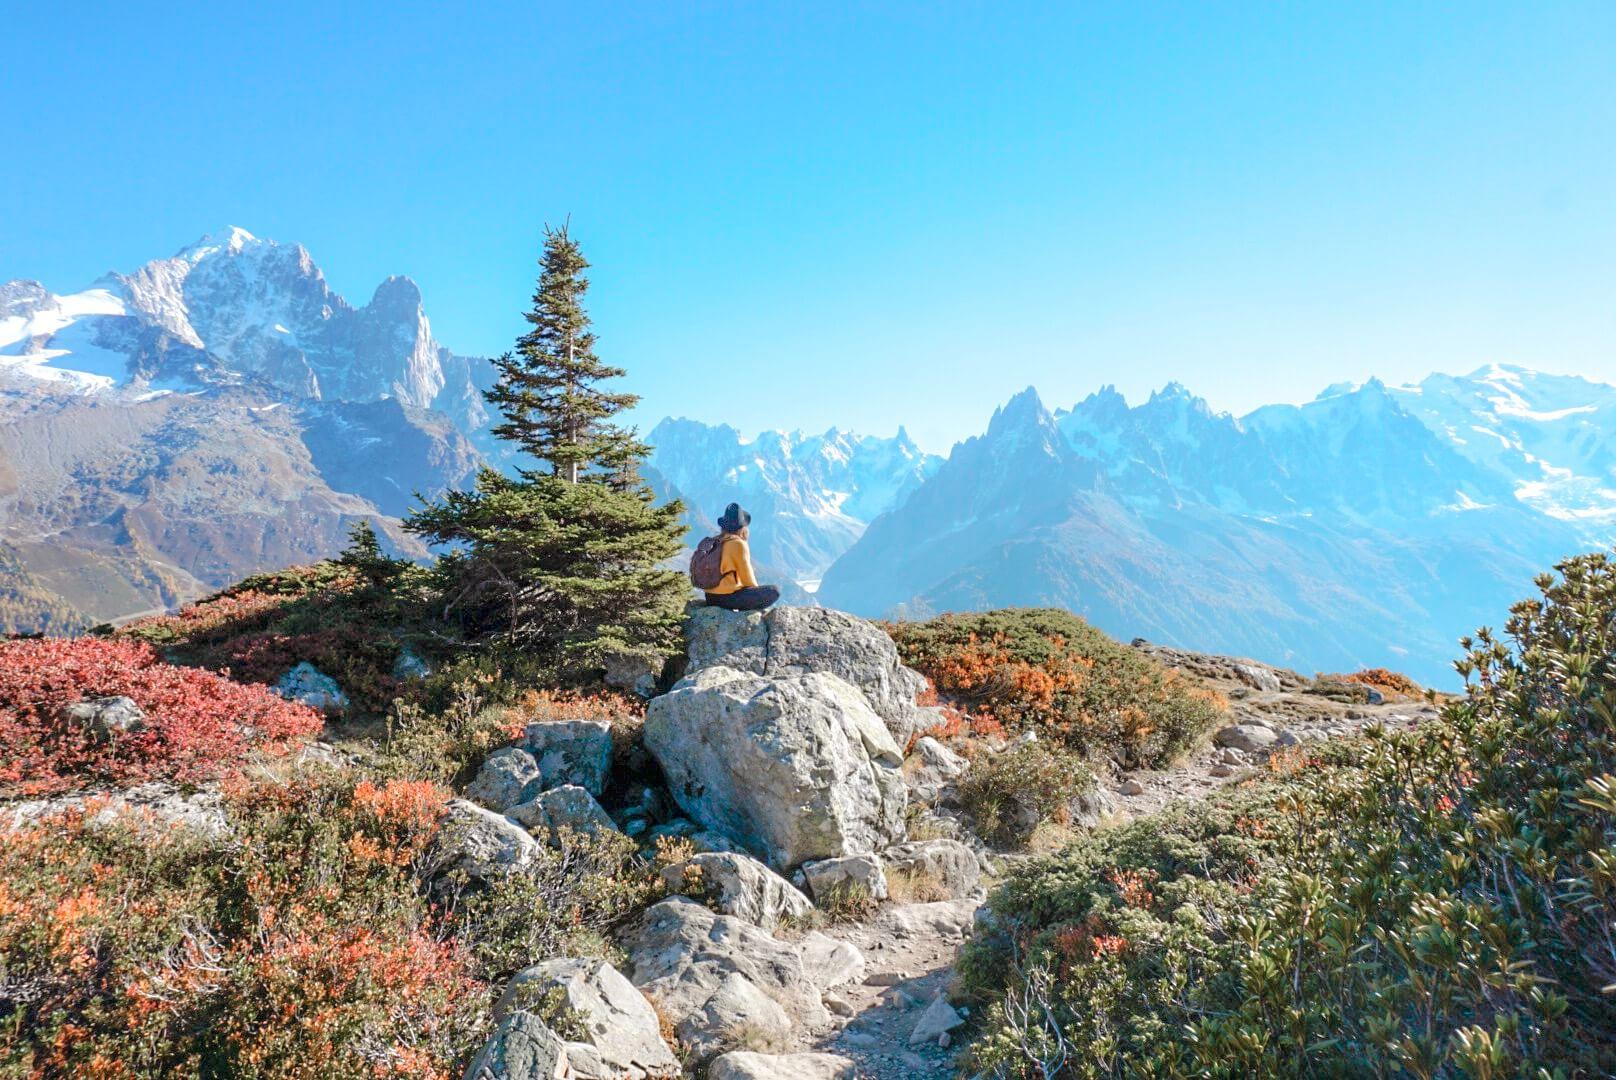 randonnée automne lac blanc cheserys chamonix